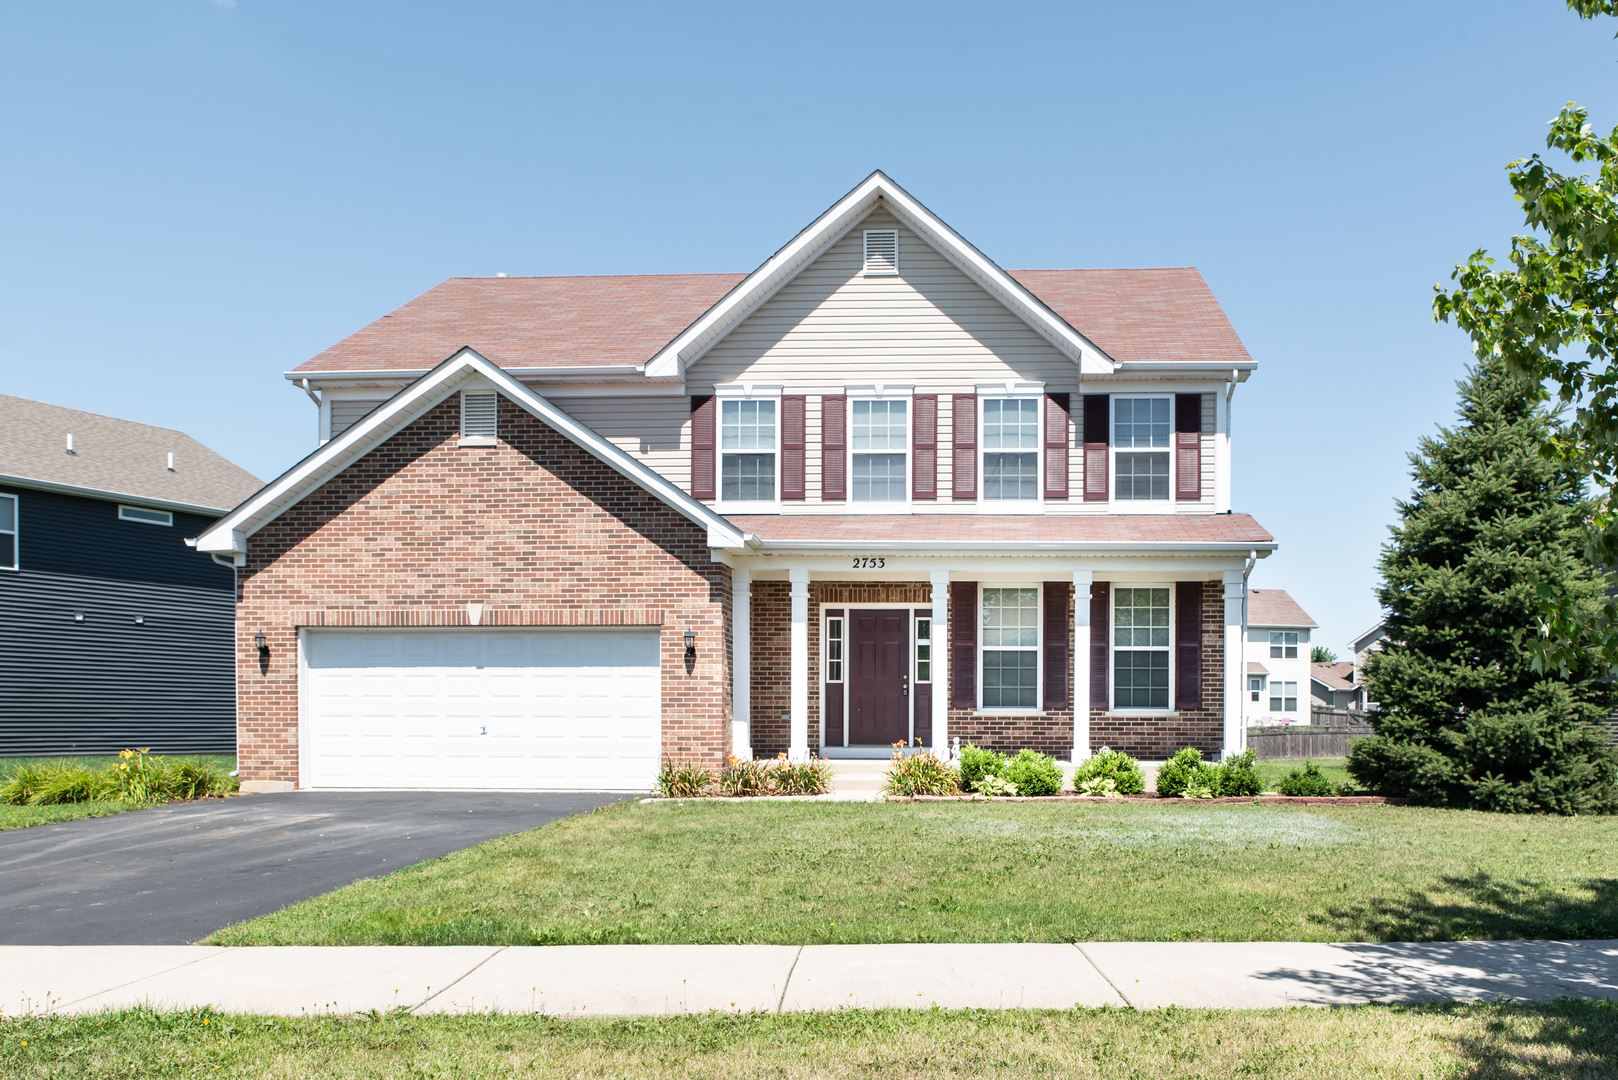 2753 Cranston Circle, Yorkville, IL 60560 - #: 10802592